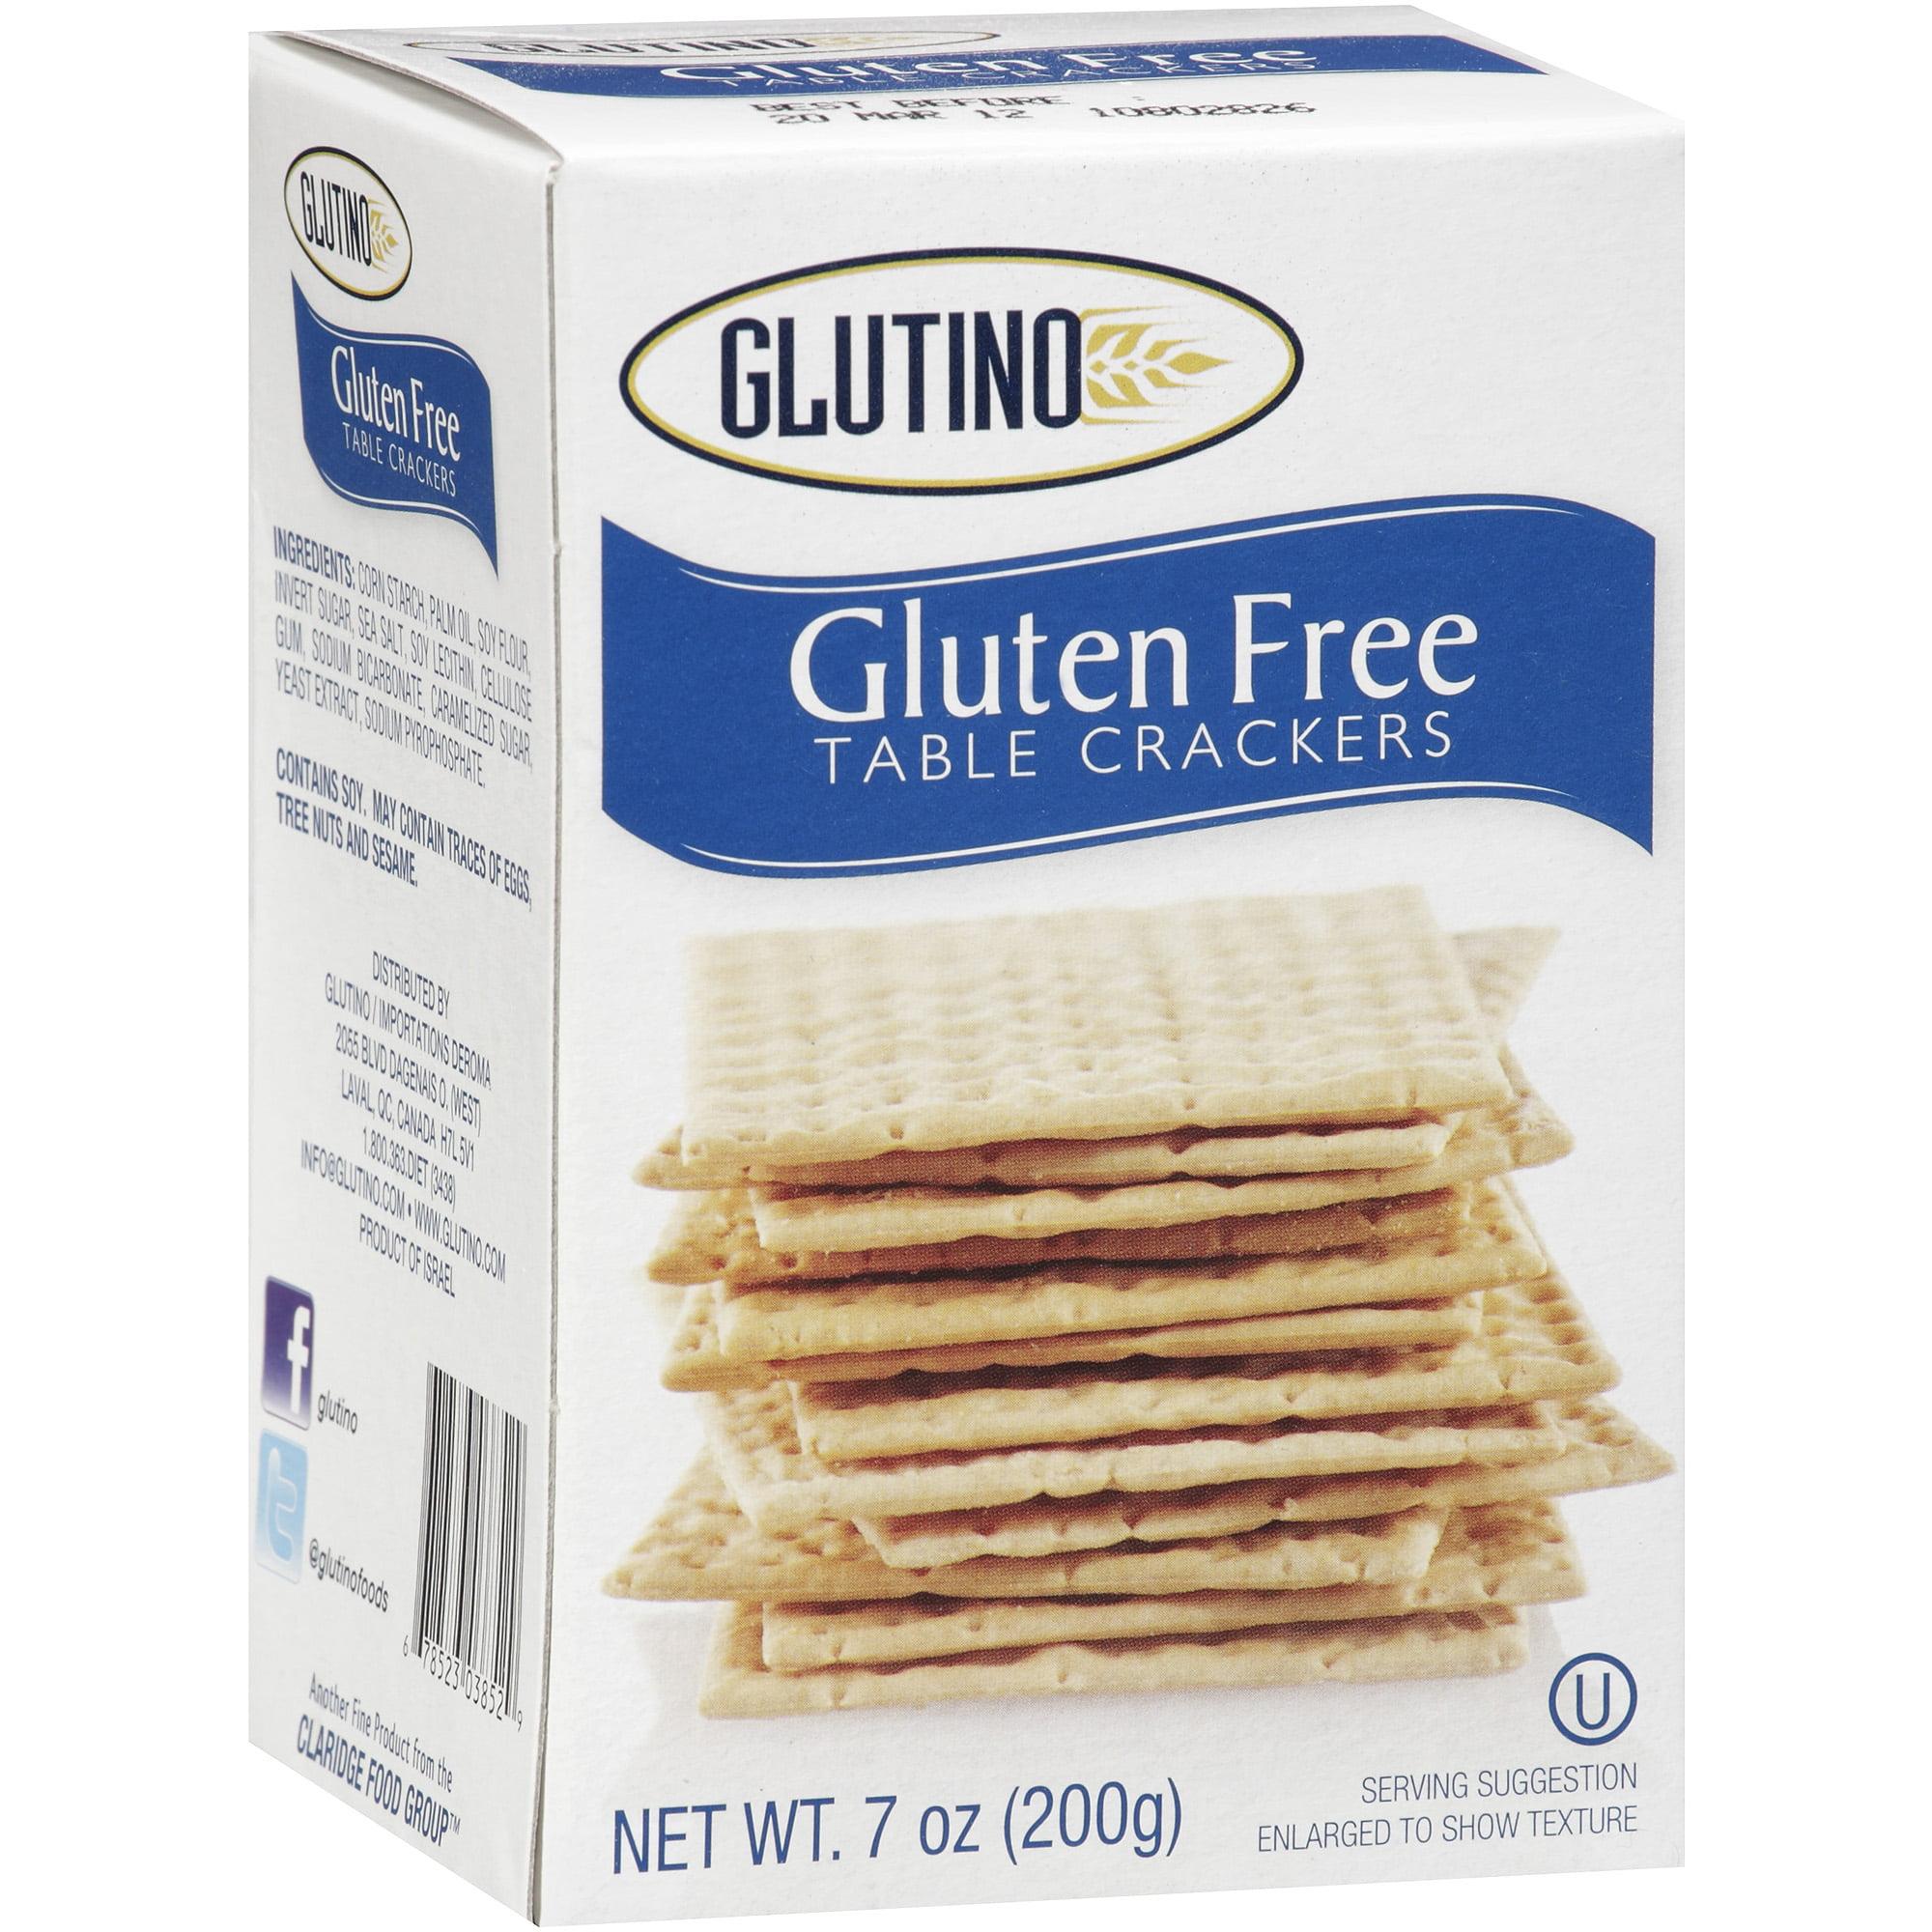 Glutino, A Boulder Brands USA, Inc. Glutino Gluten Free Table Crackers, 7 oz